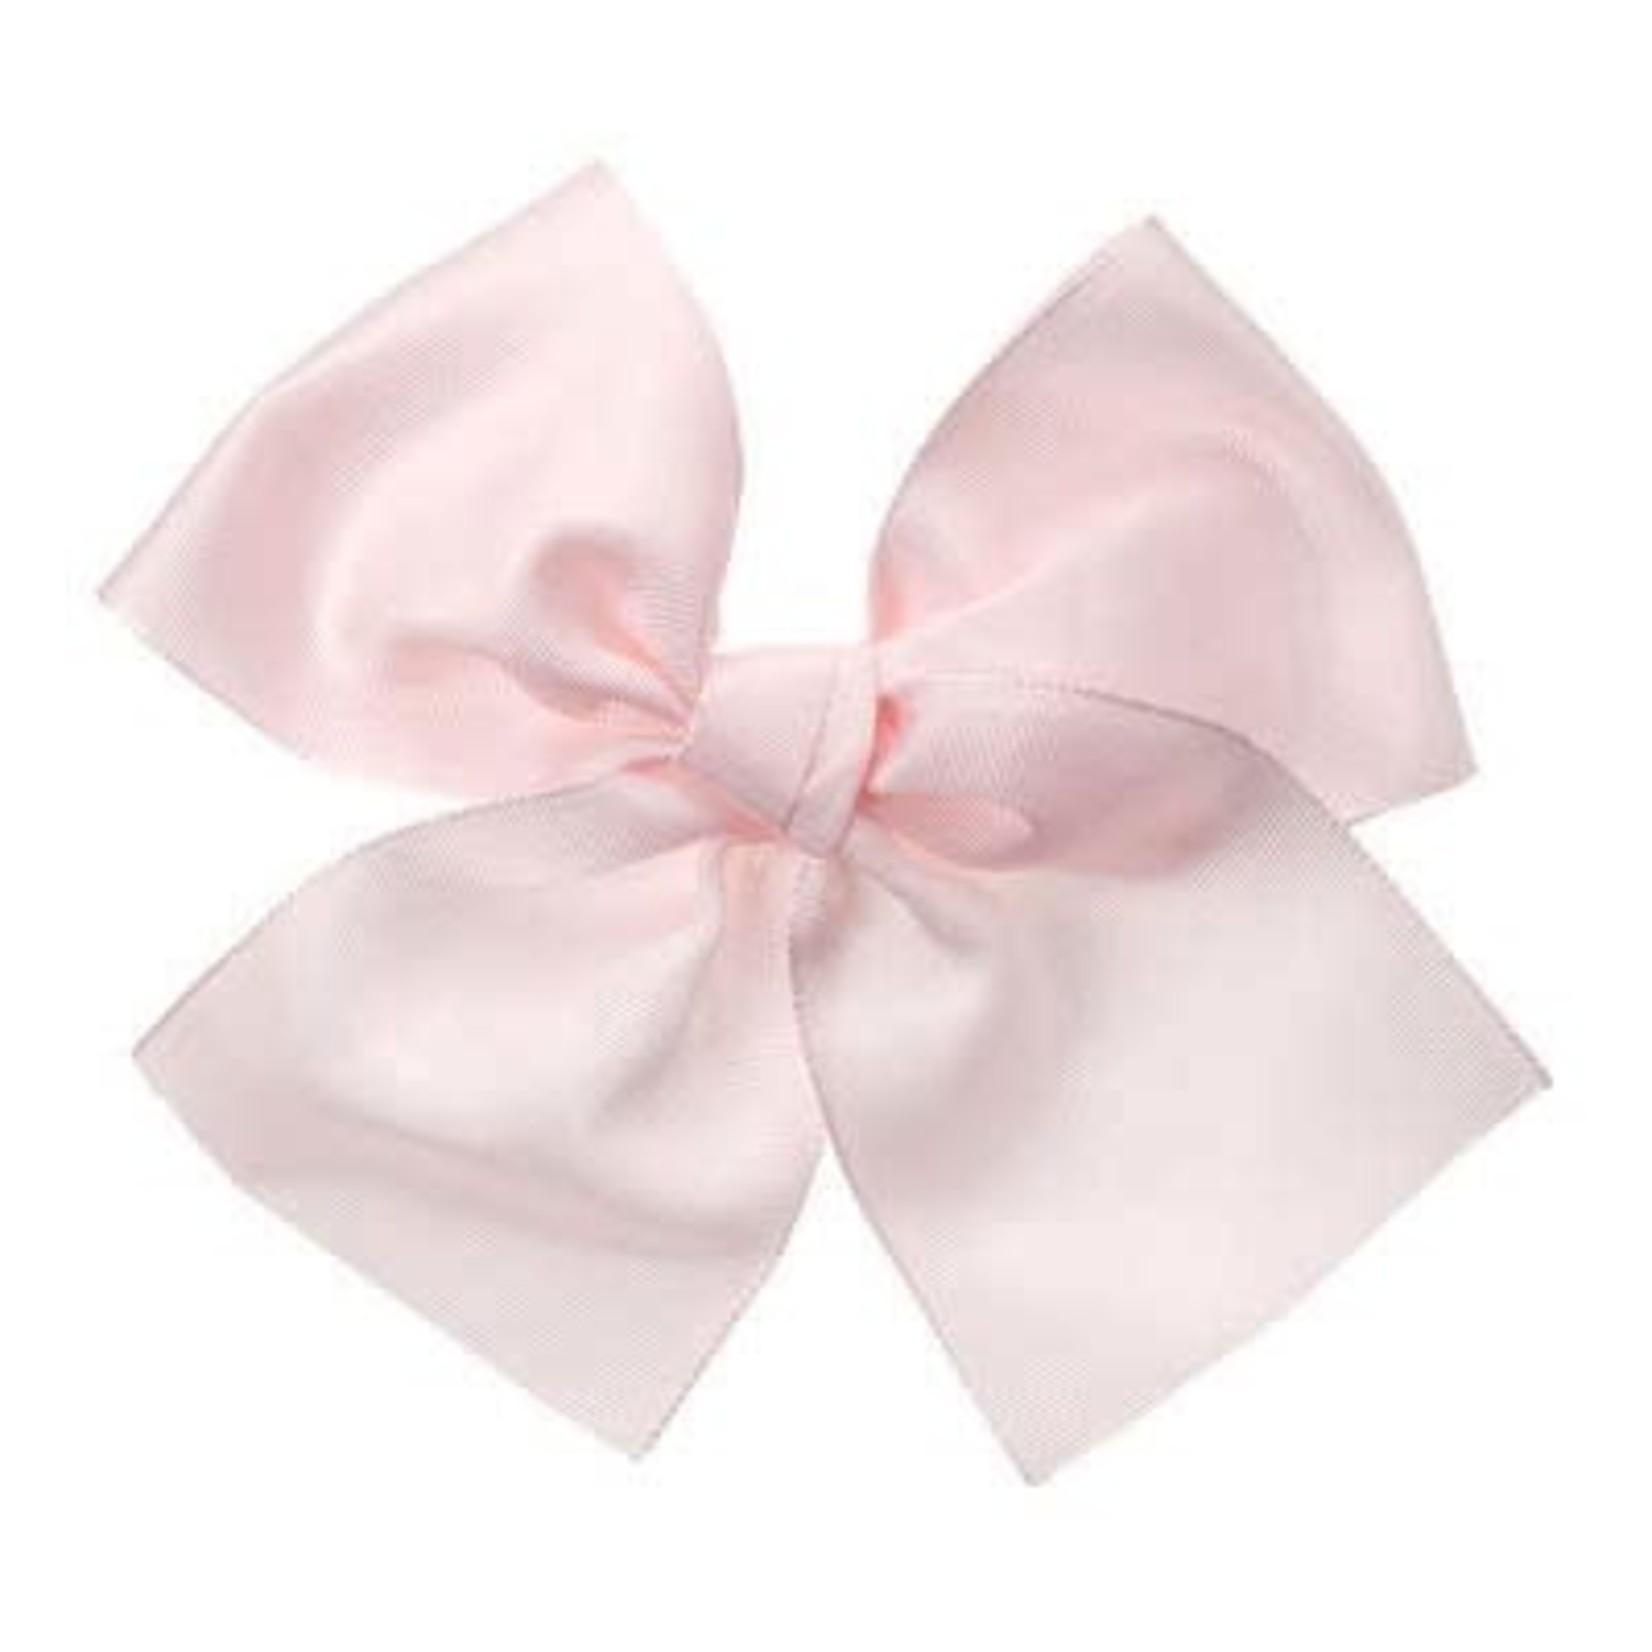 Siena Big Bow - Pink Light